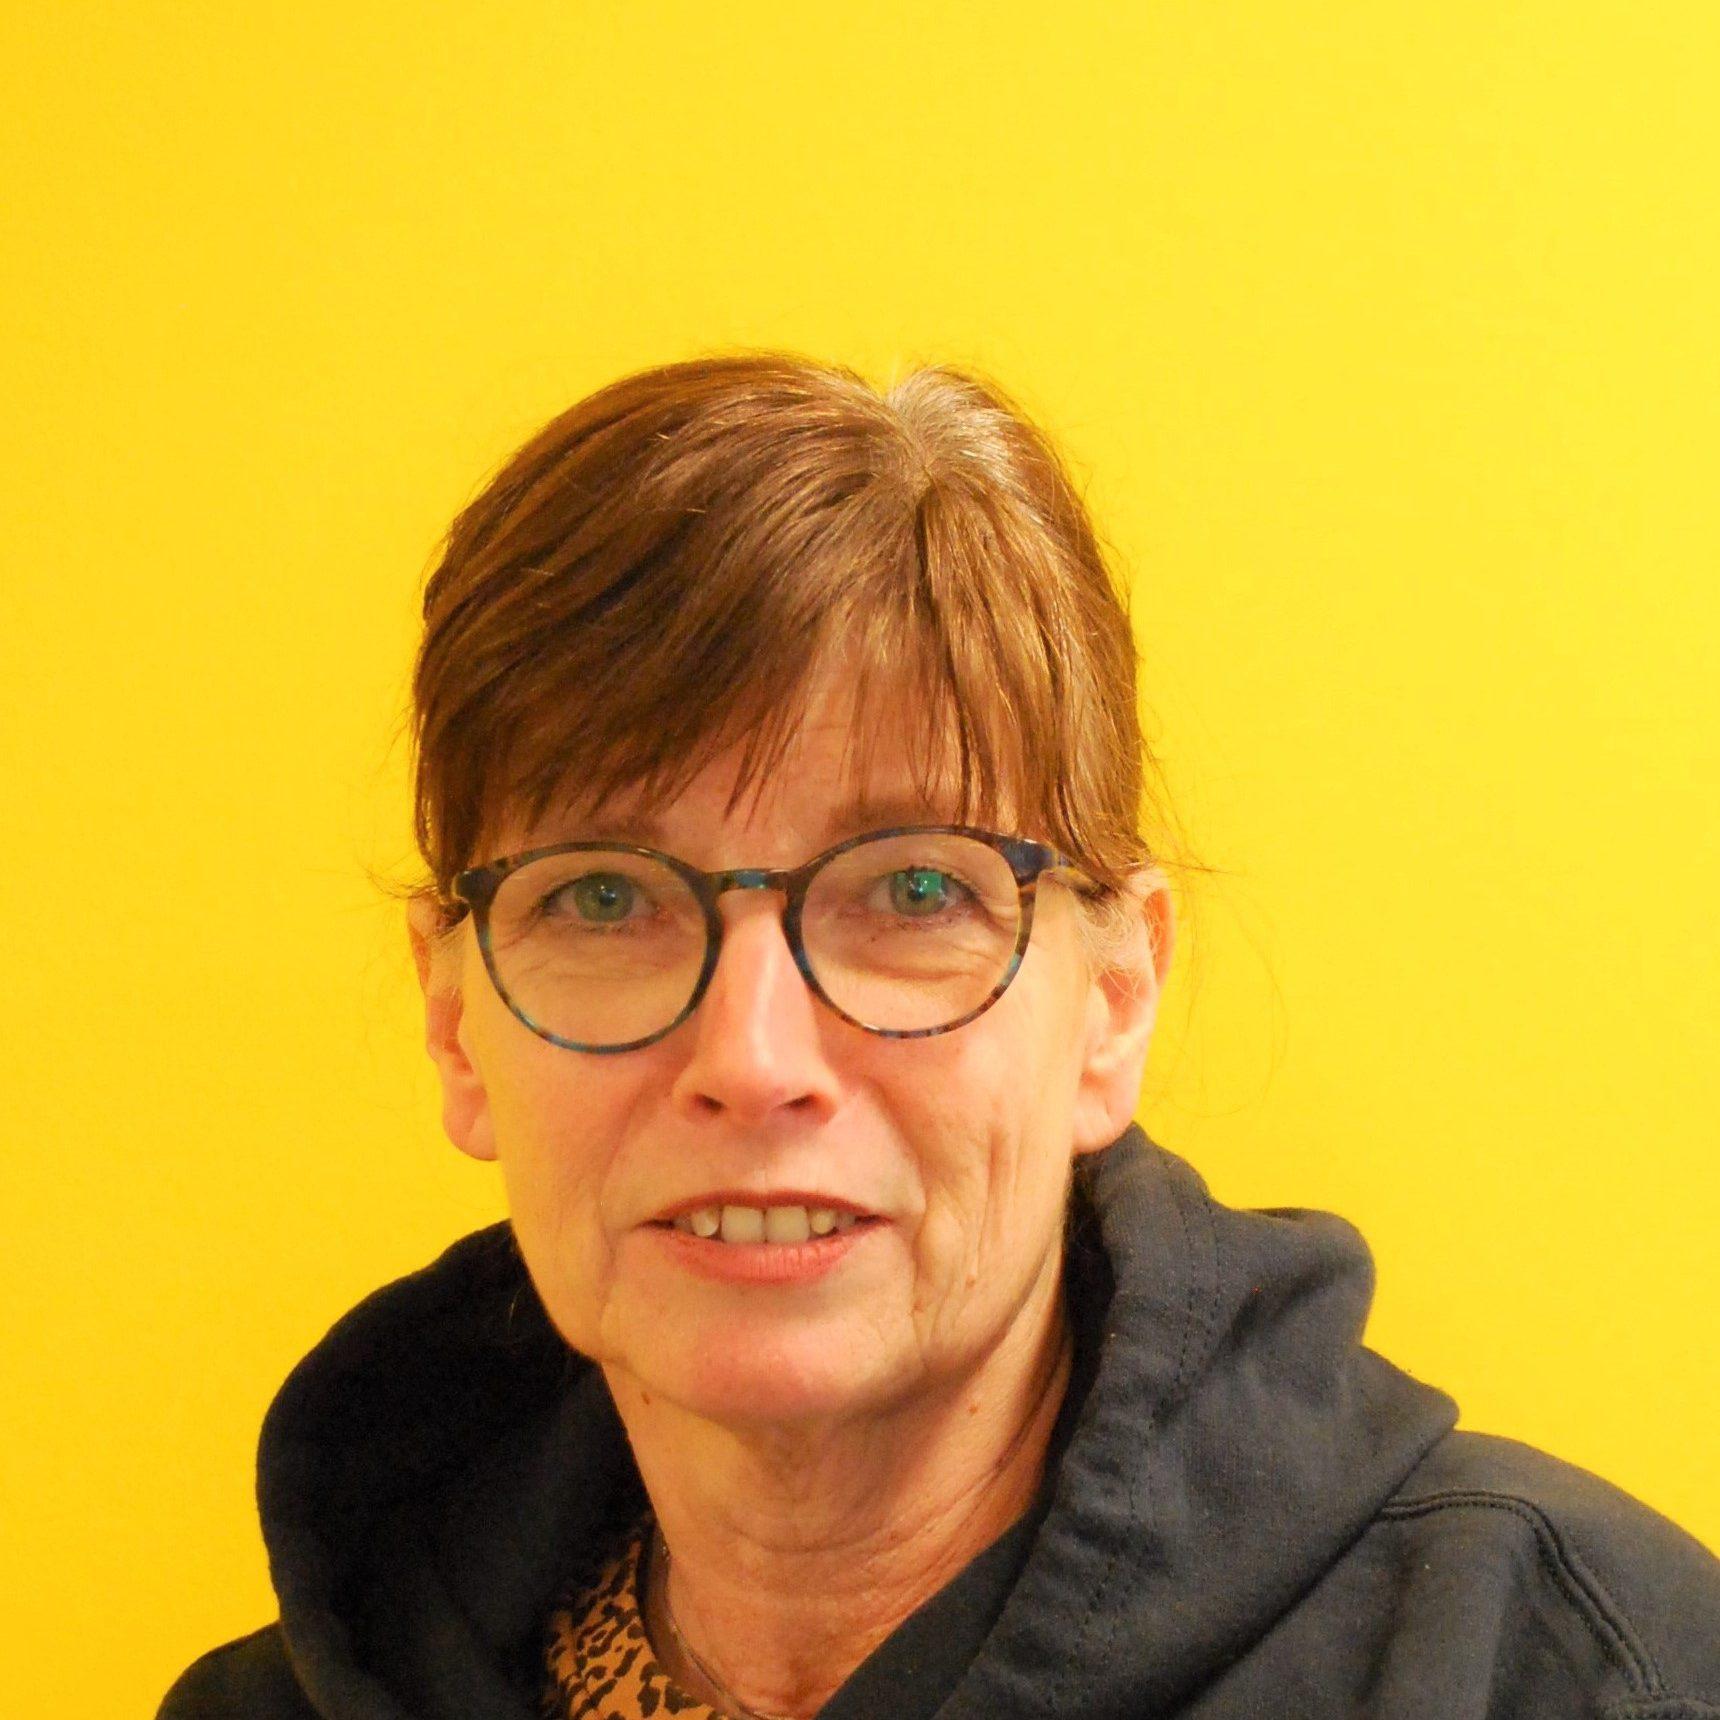 Rita Puttkammer-Potgieter